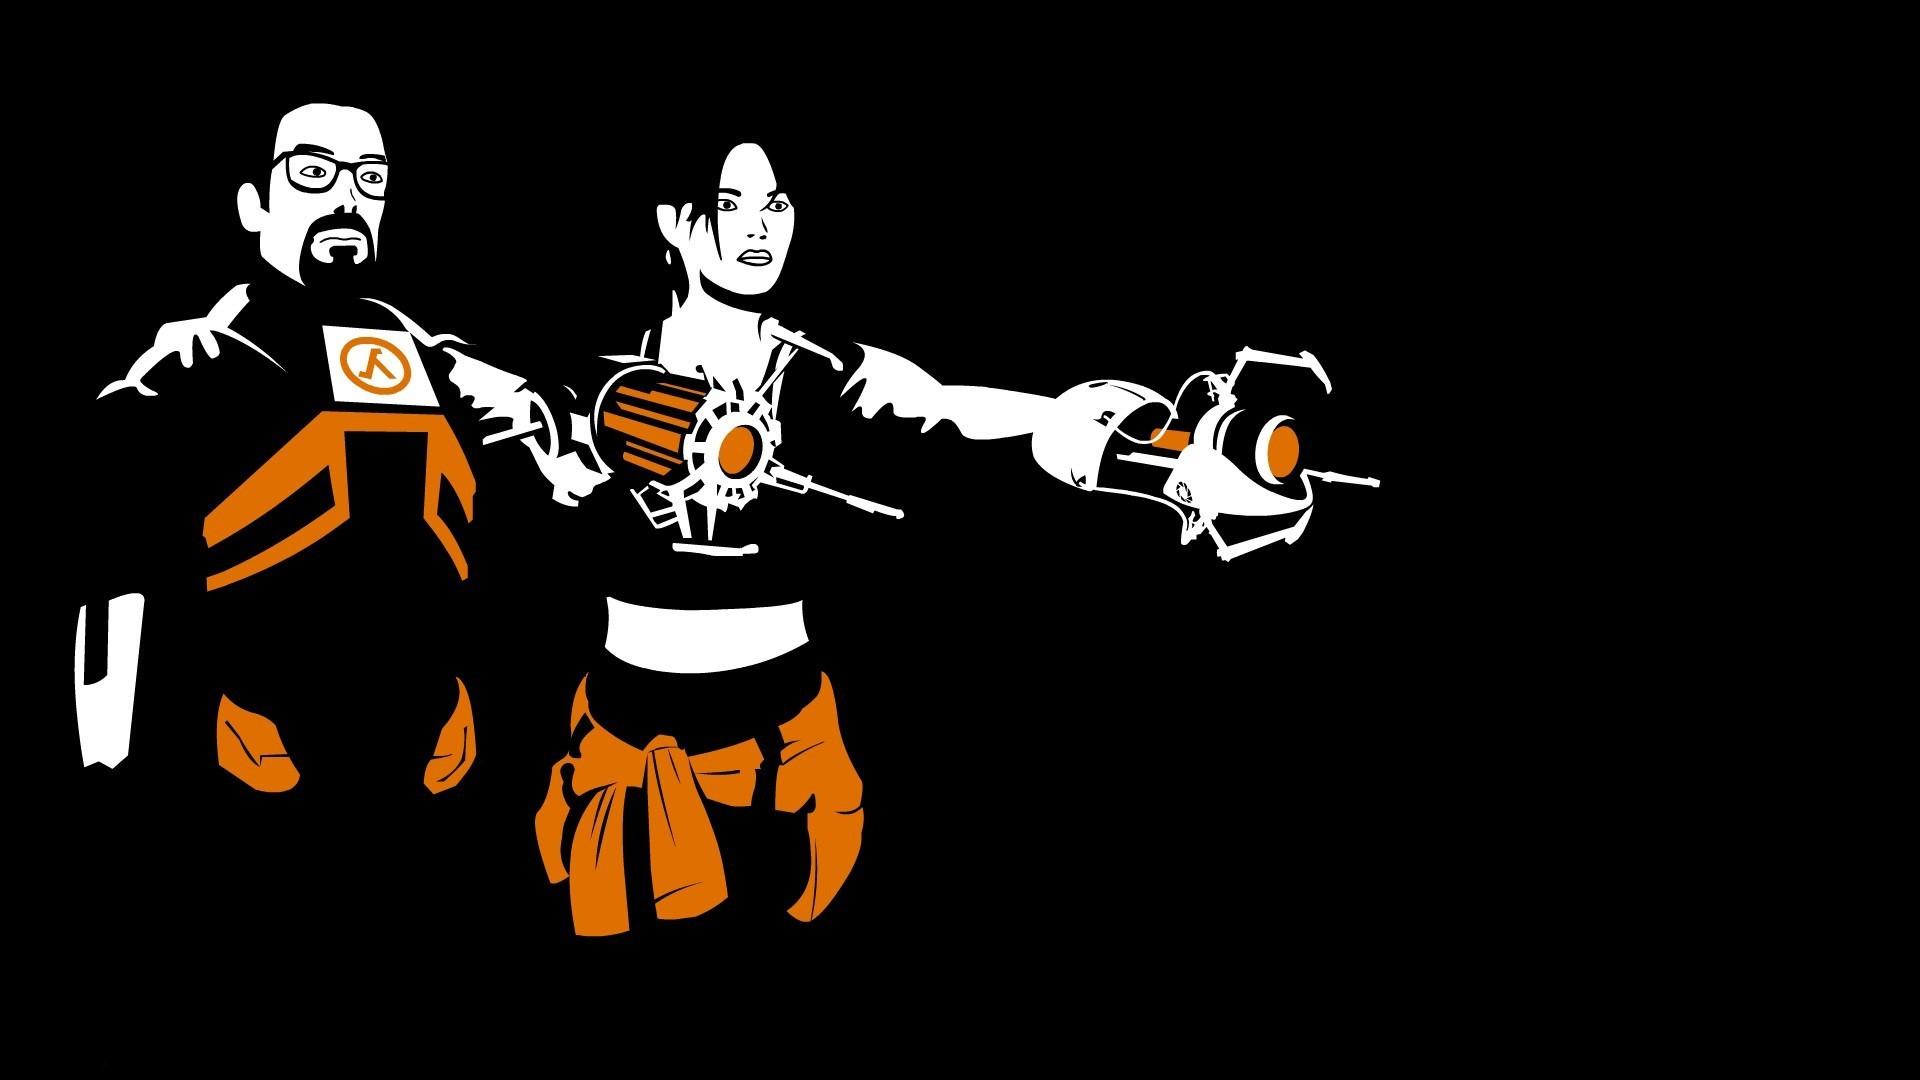 Wallpaper 1920x1080 Px Black Background Half Life 2 Orange